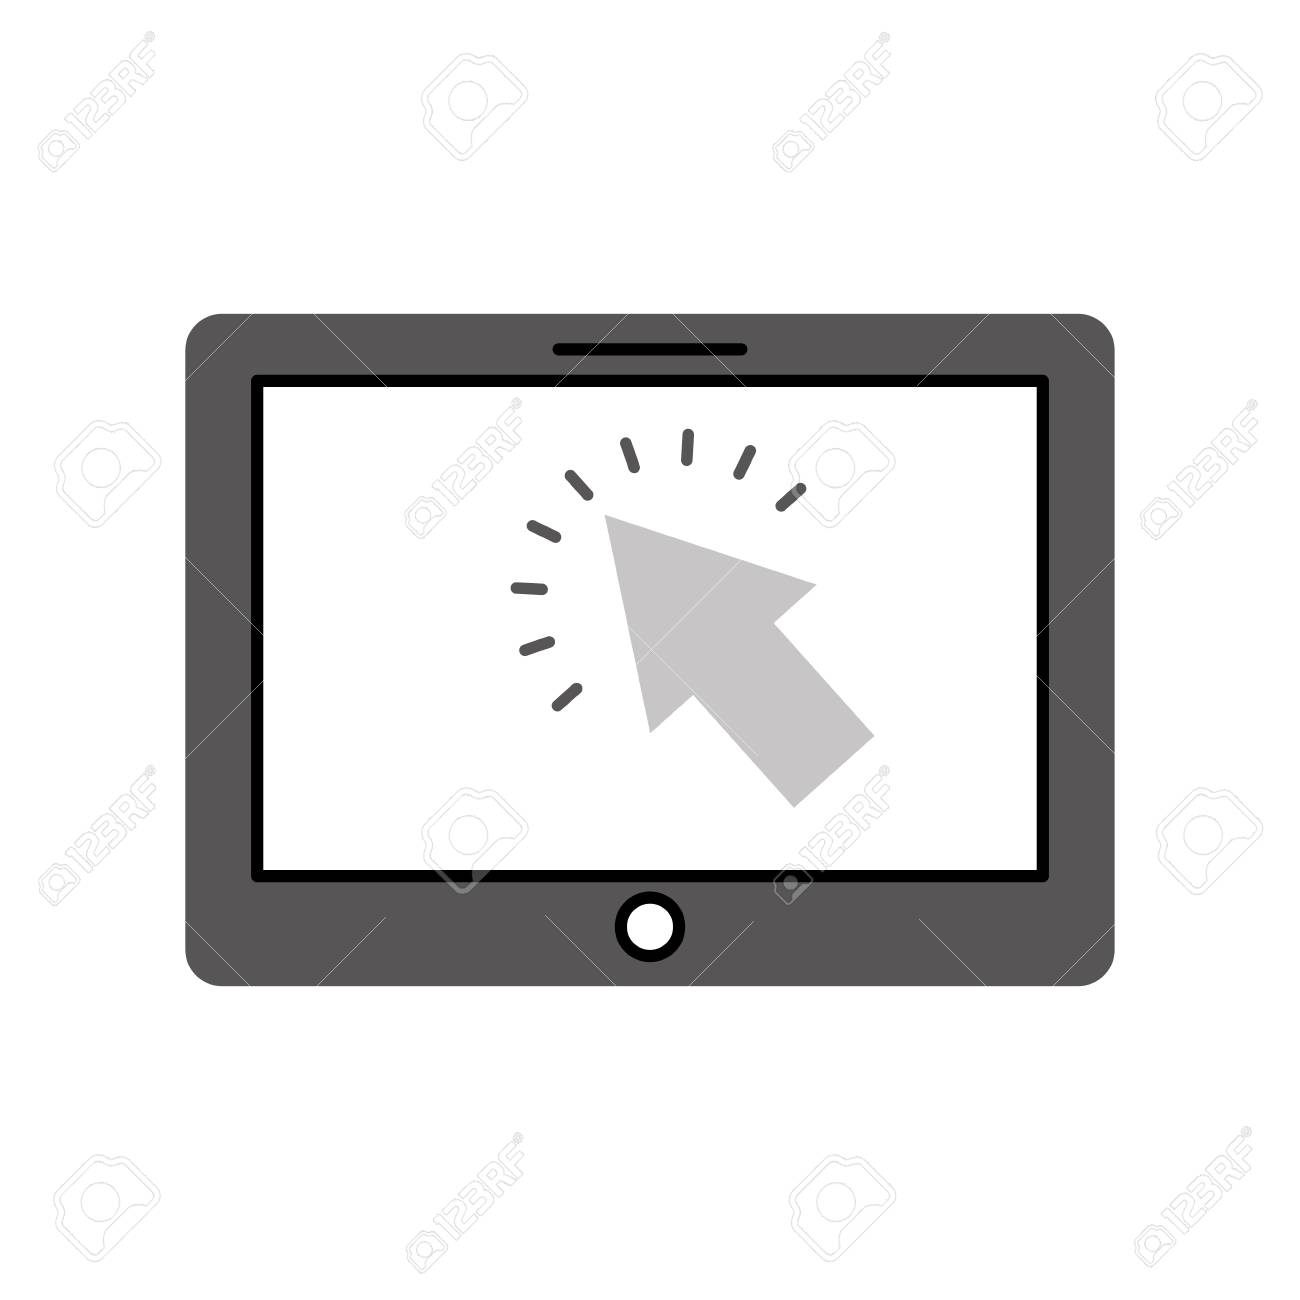 tablet with cursor button digital technology vector illustration - 87257703